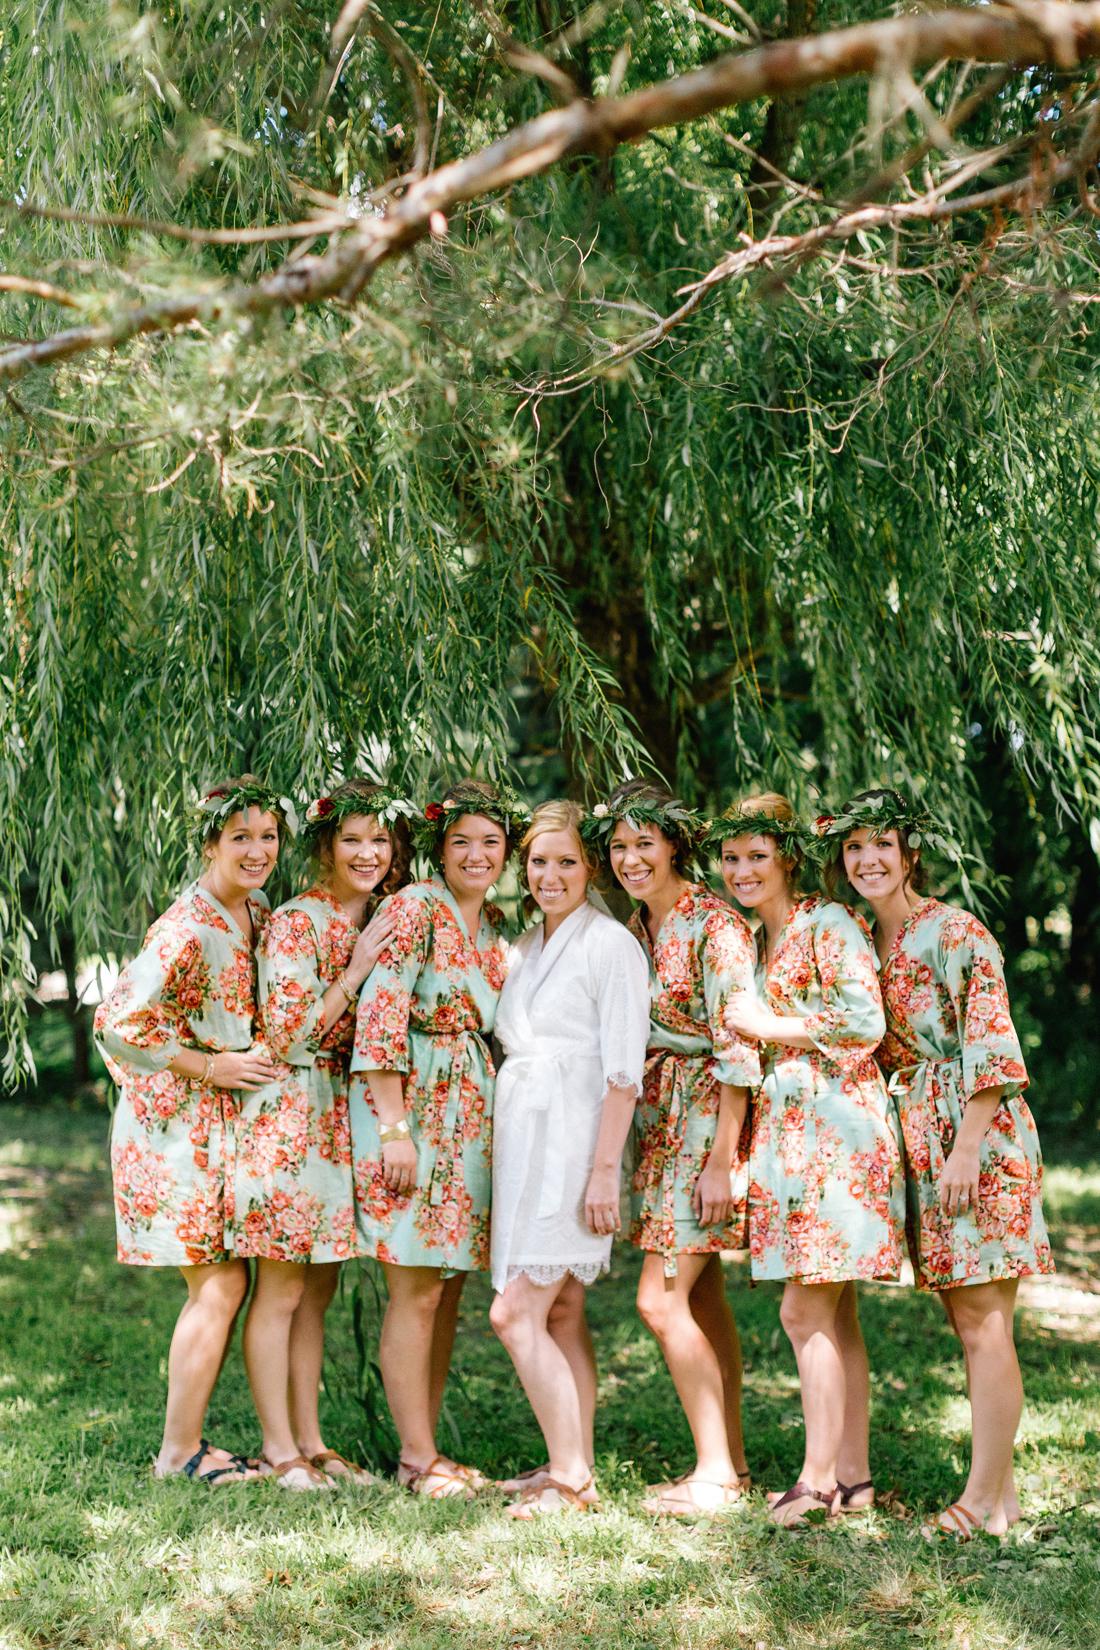 www.allisonhopperstad.com, Minnesota Wedding Photographer, Barn Wedding, Apple Orchard Wedding, Minnesota Harvest Apple Orchard, Summer Wedding, Outdoor Wedding, Wedding in the woods